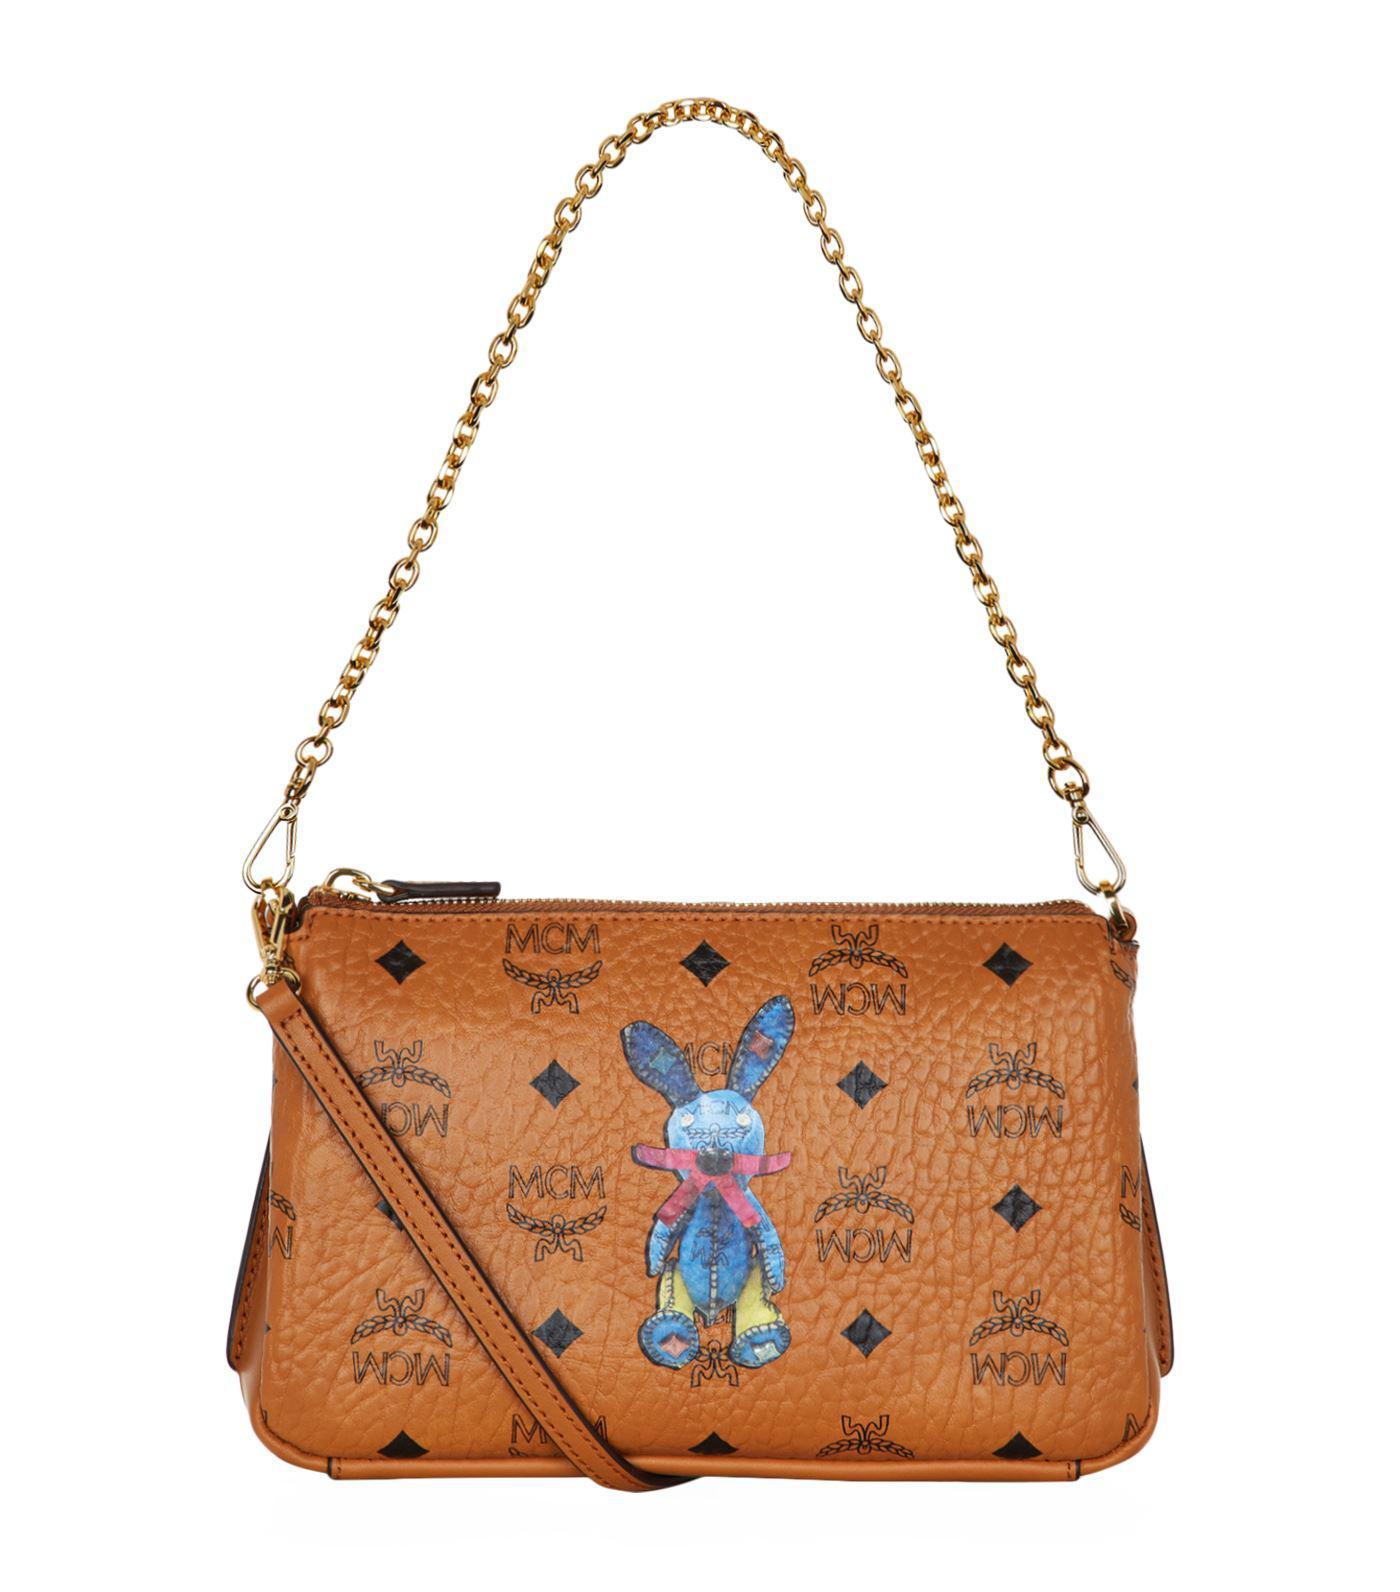 392134933 Lyst - MCM Medium Rabbit Cross Body Bag in Brown